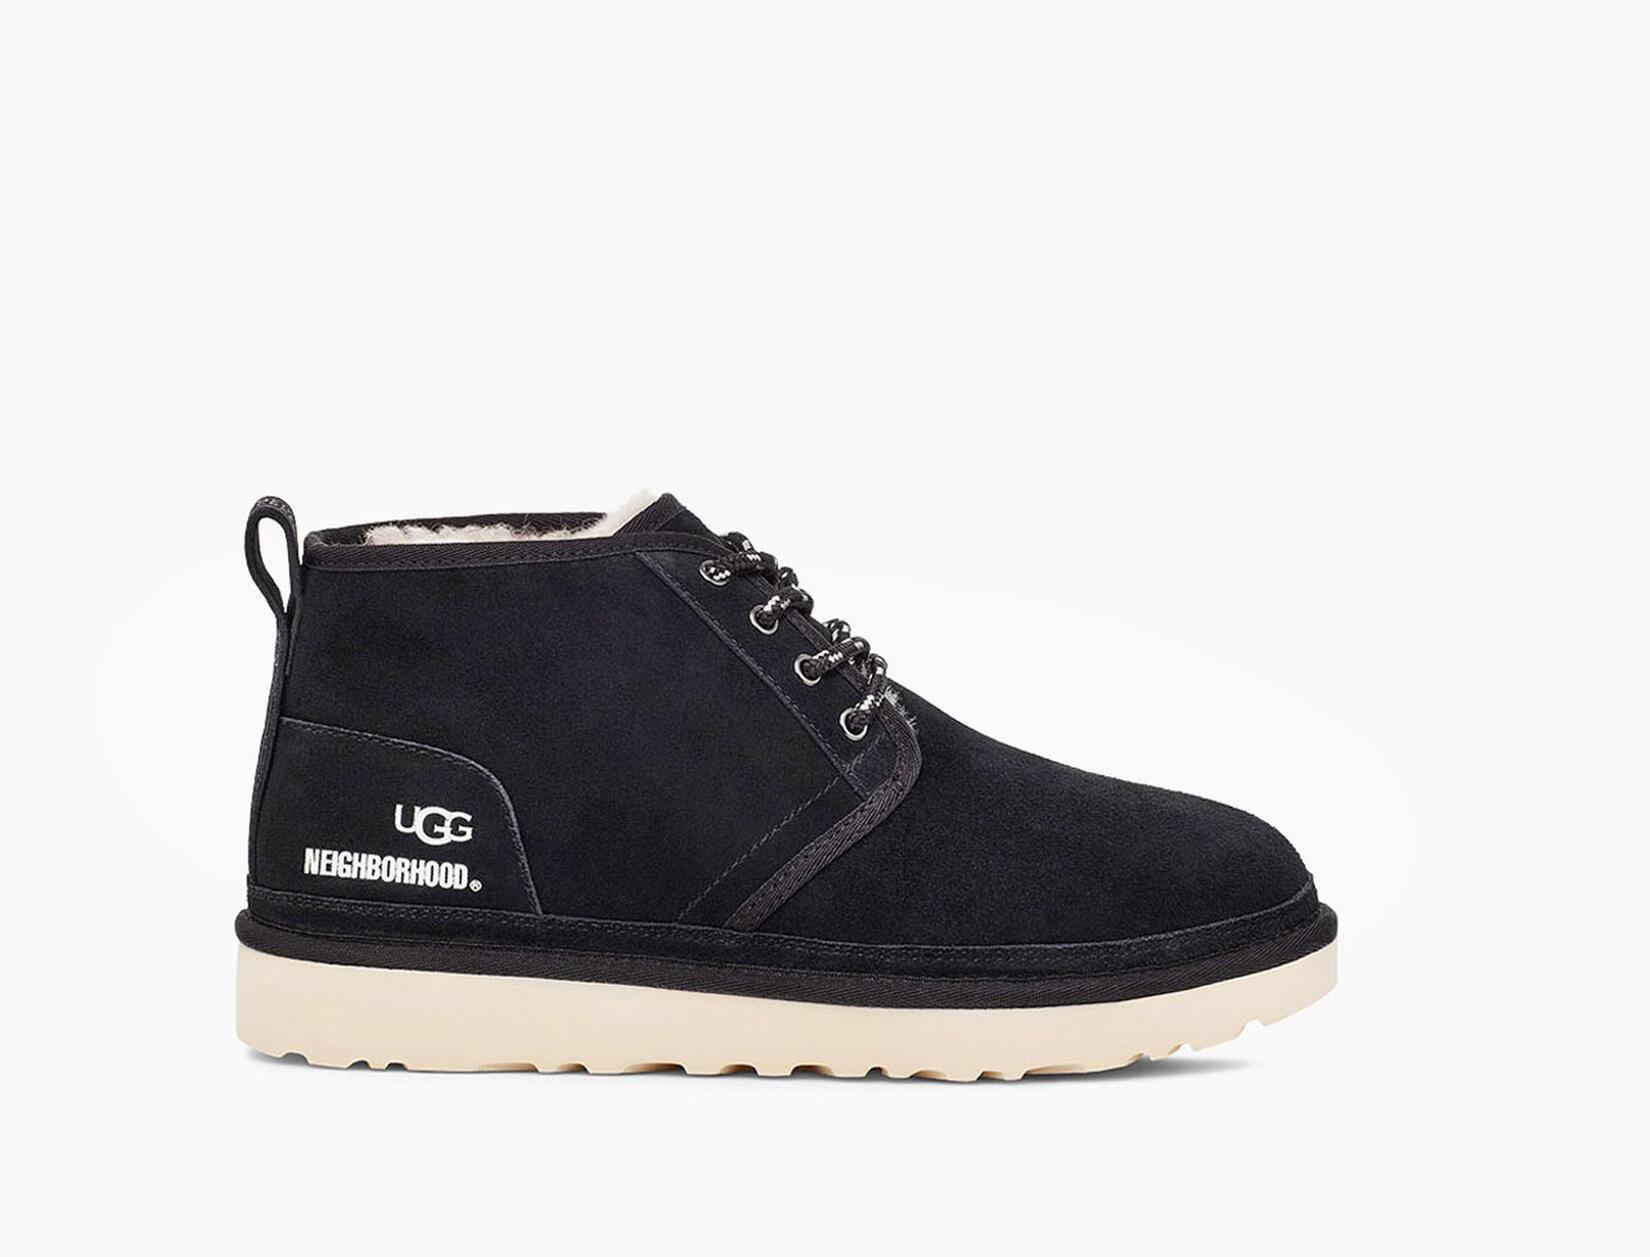 UGG X NBHD Neumel Boot